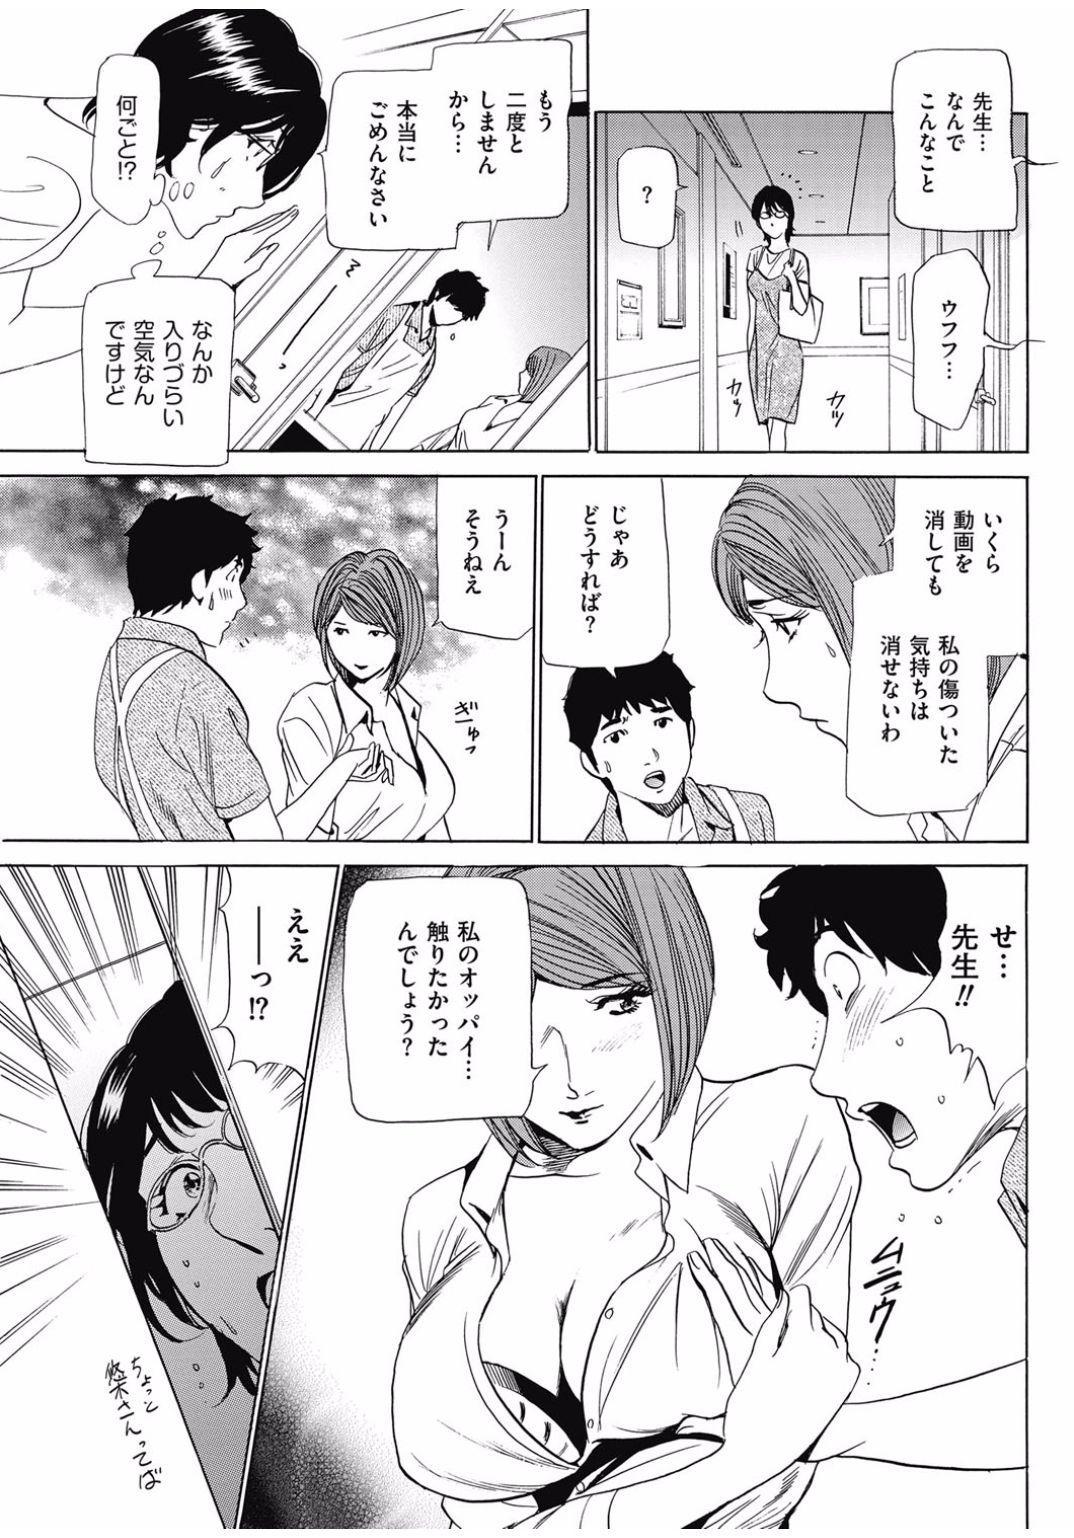 Wa Usuki Ipa a 1-10 81